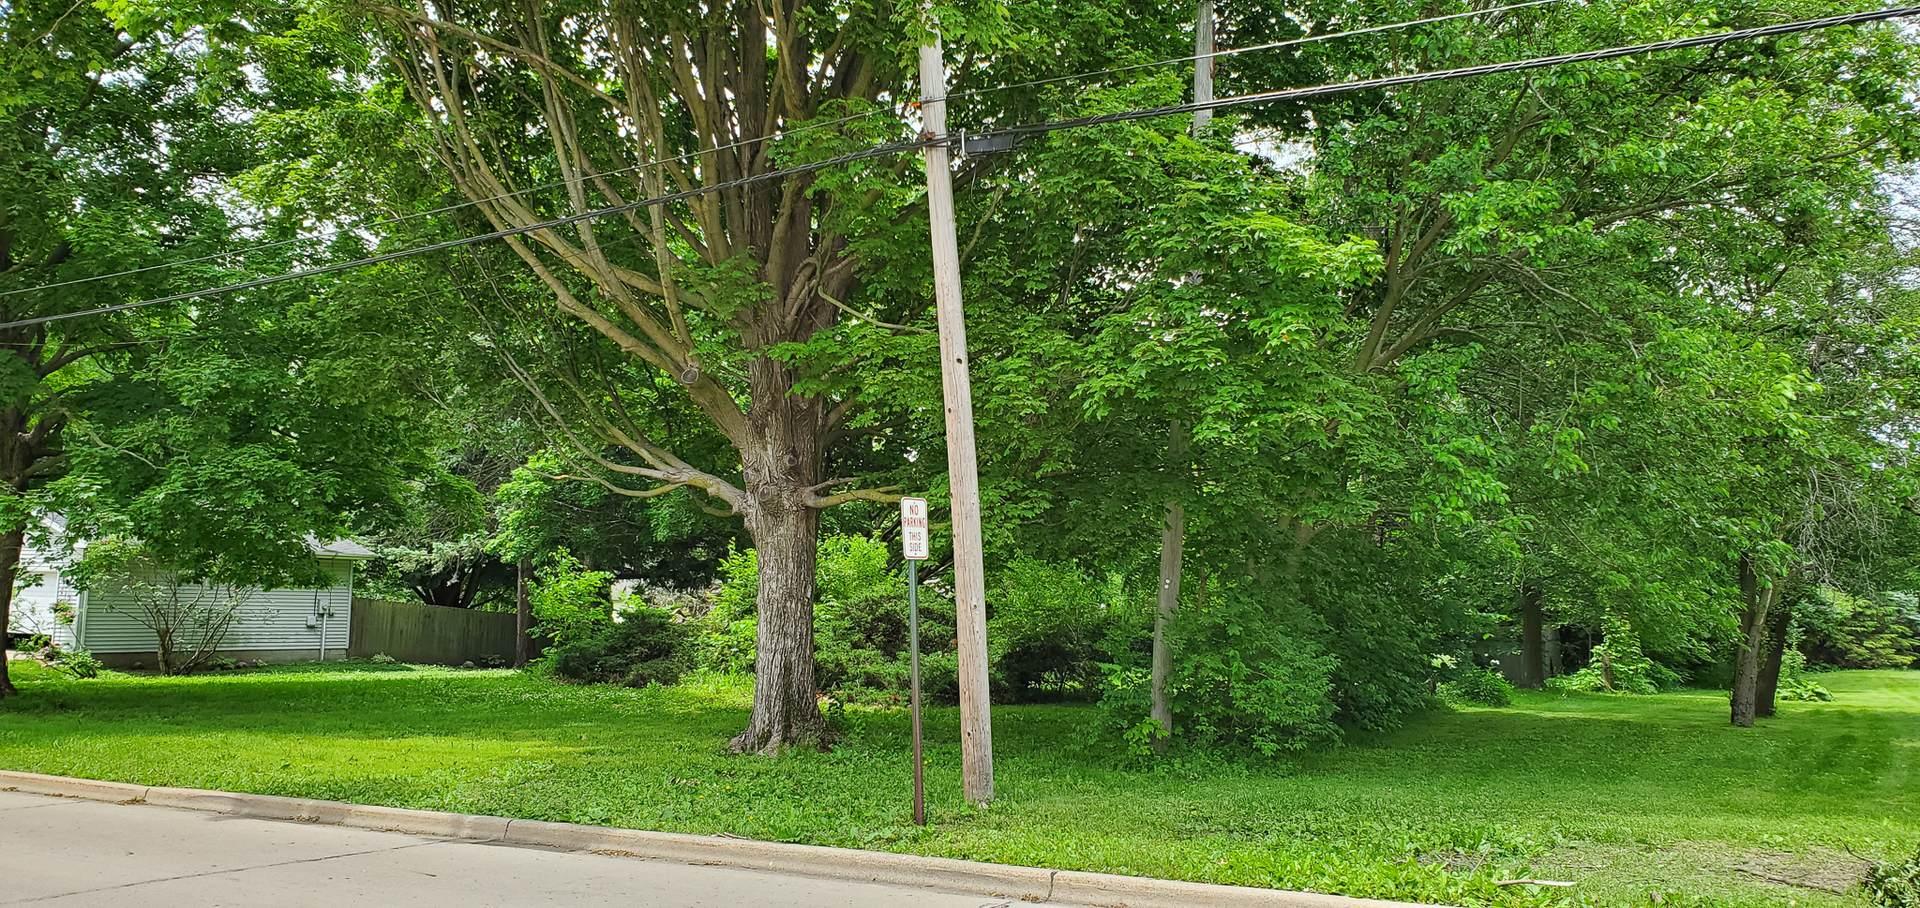 205 N Grove Street, Normal, IL 61761 (MLS #10737640) :: Janet Jurich